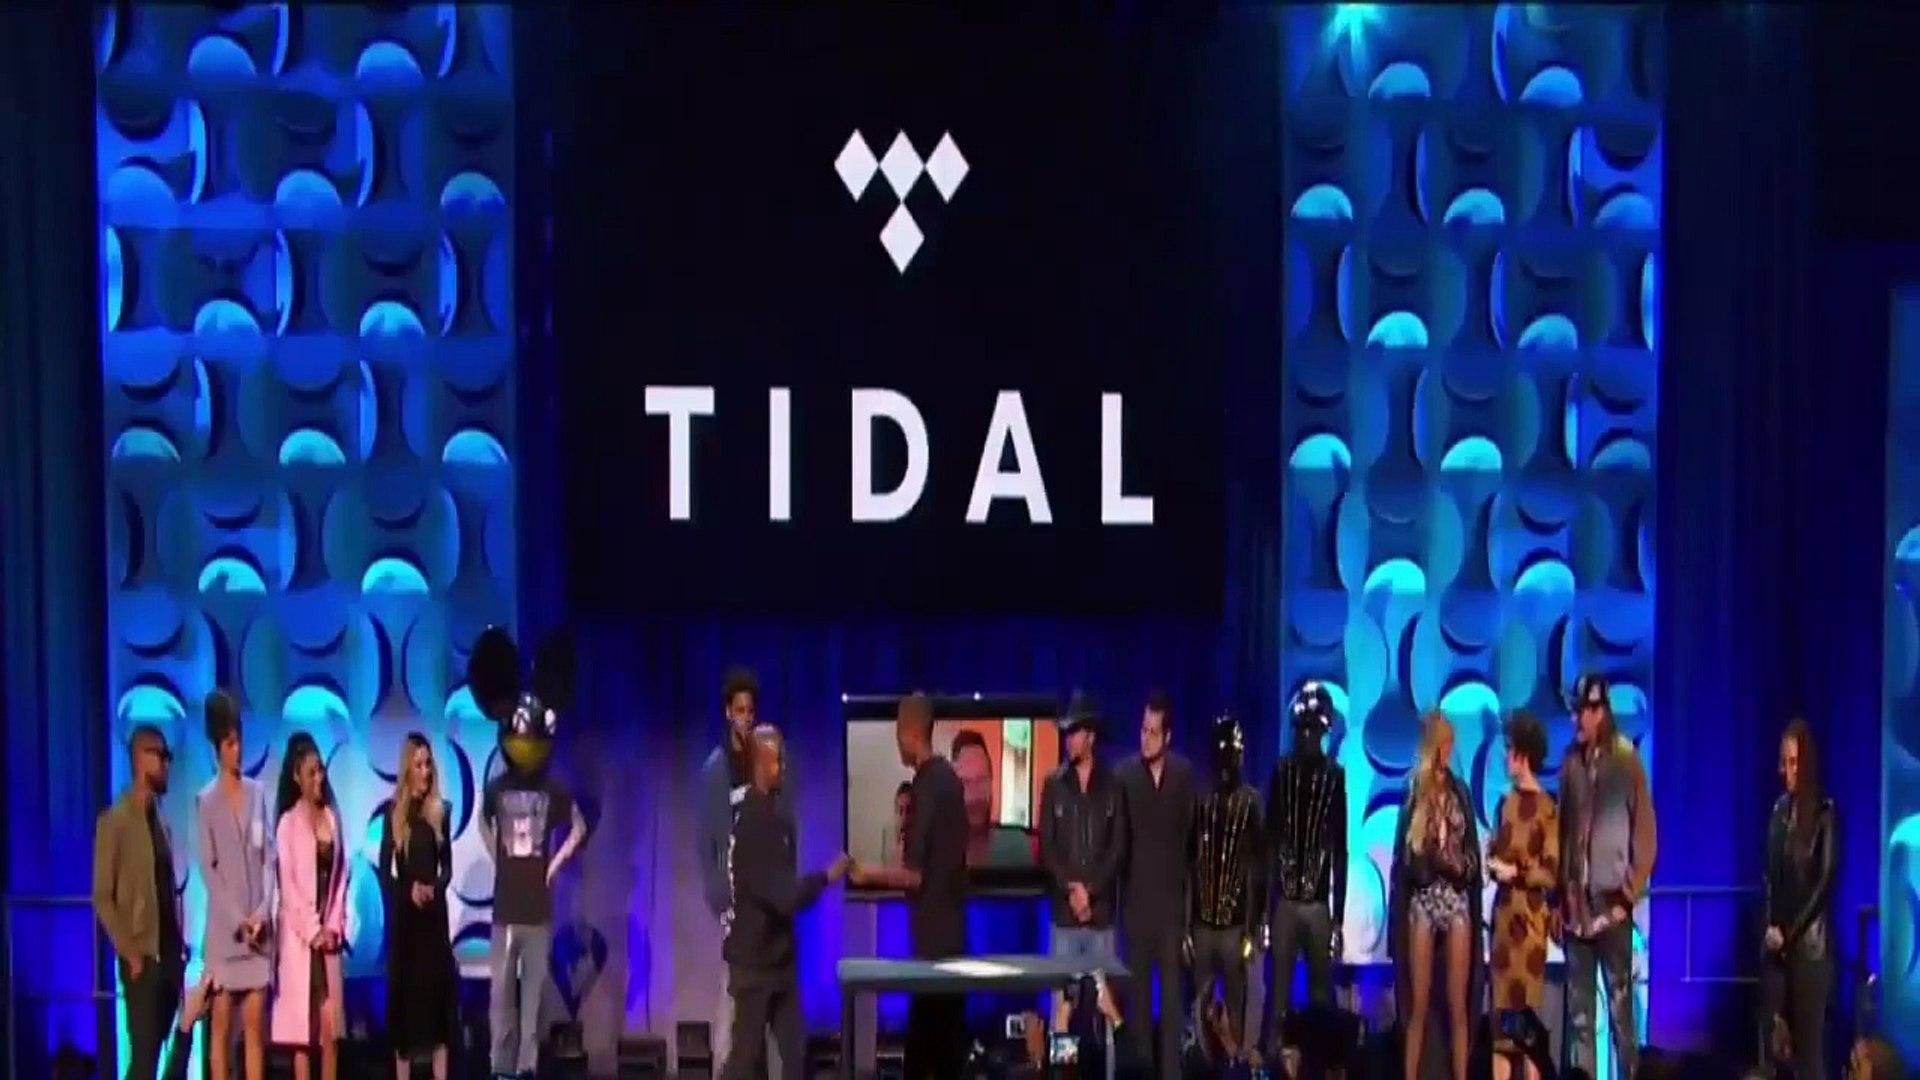 Rihanna, Beyoncé, Nicki Minaj signing the Tidal For All contract 2015 #tidal